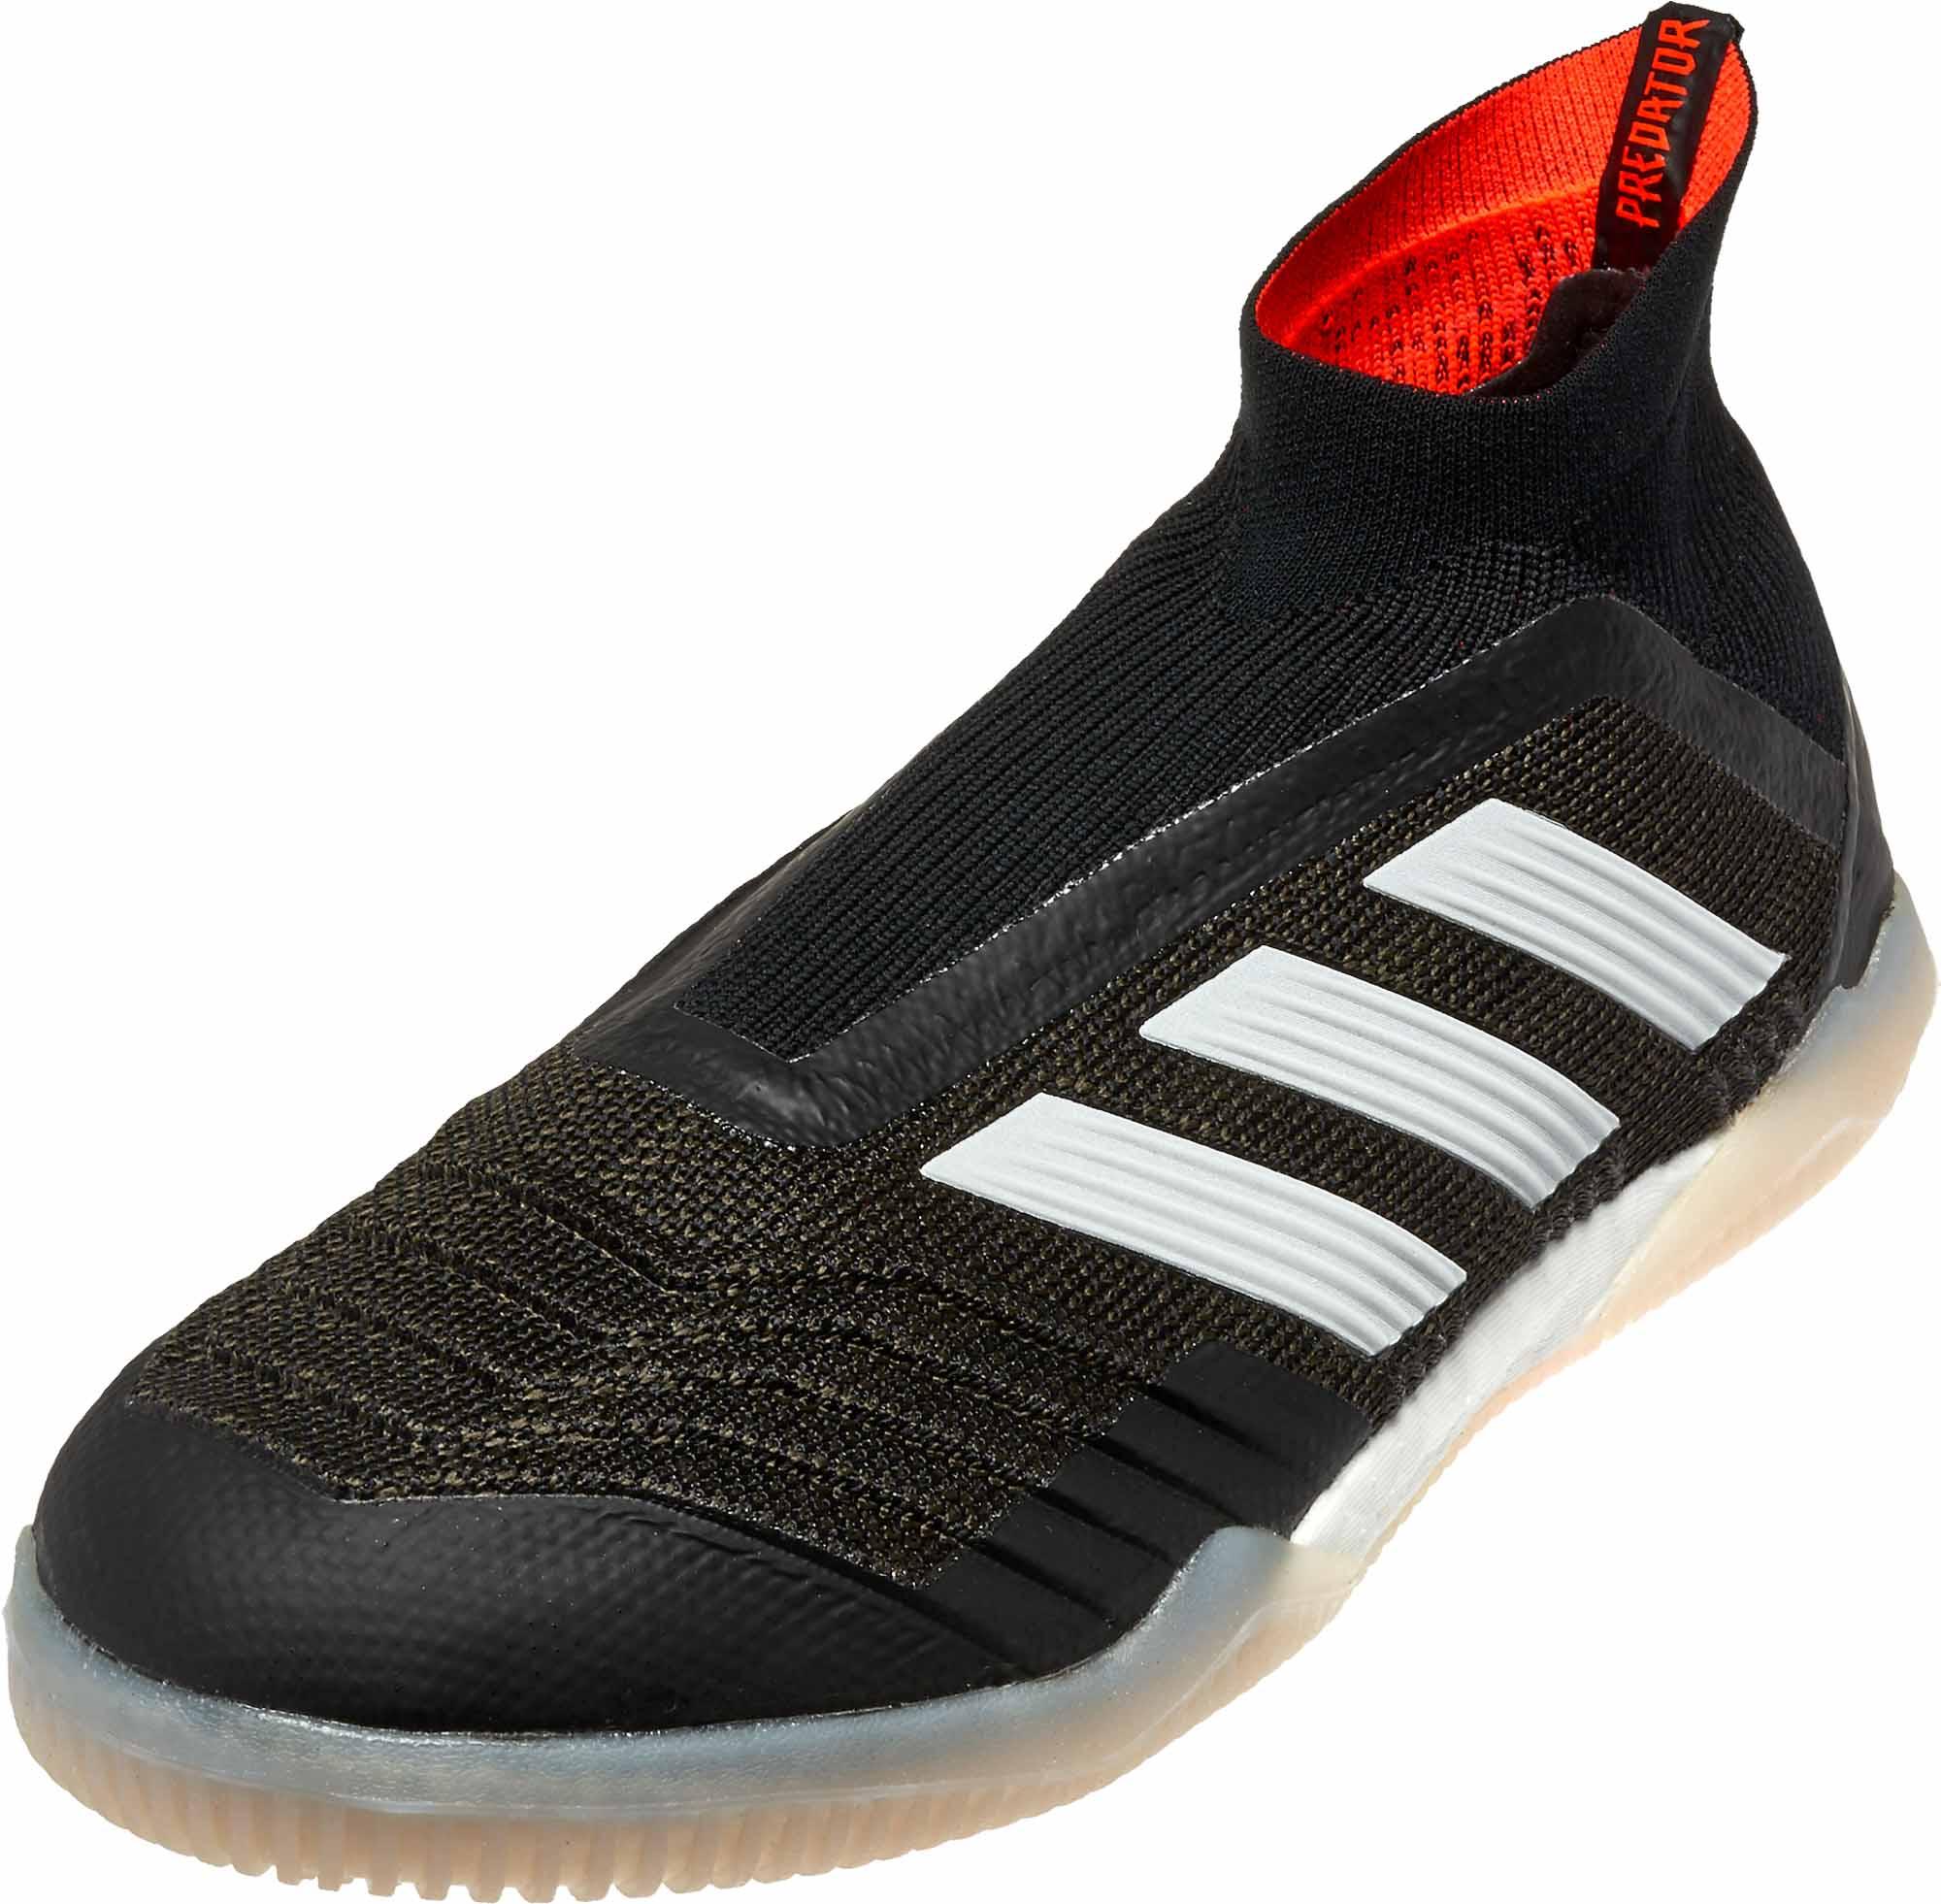 adidas Predator Tango 18 IN Black Indoor Soccer Shoes